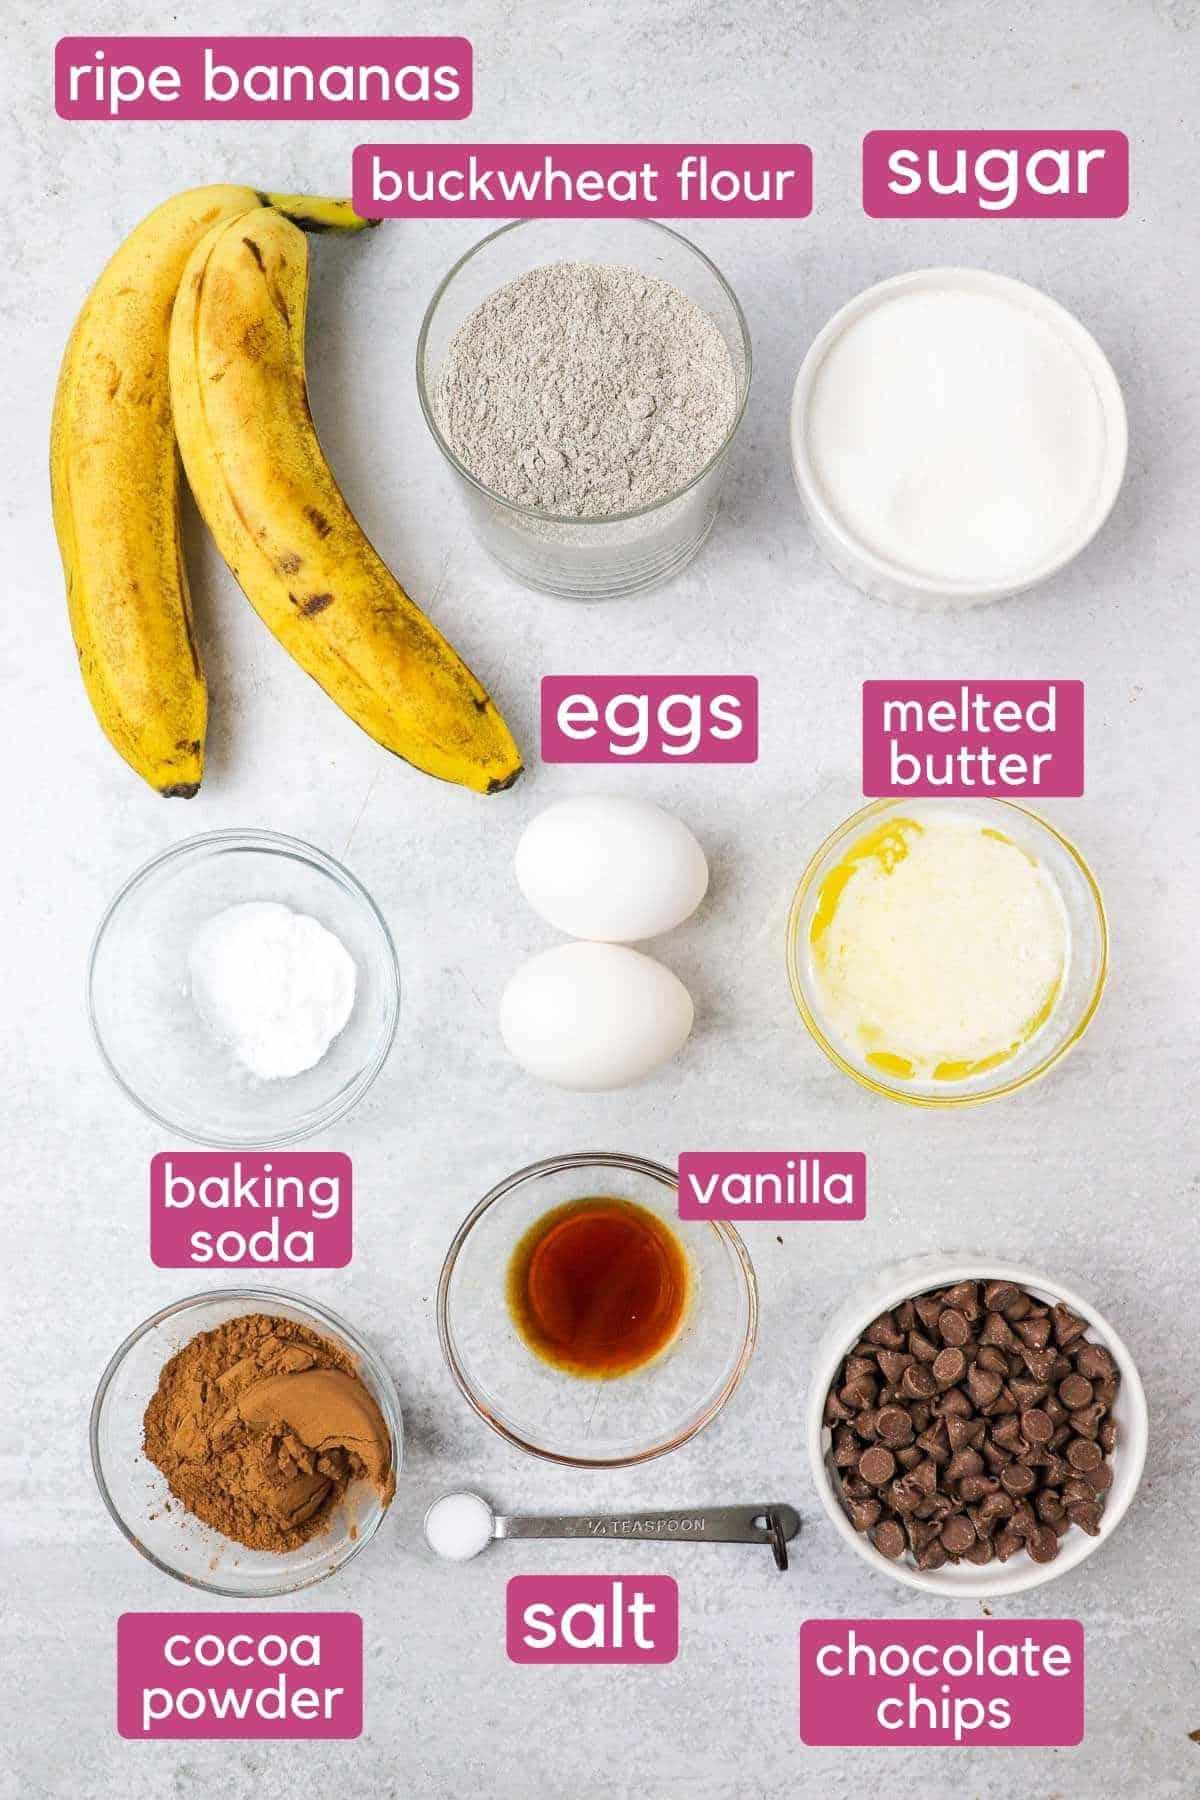 ingredients for double chocolate buckwheat banana muffins.